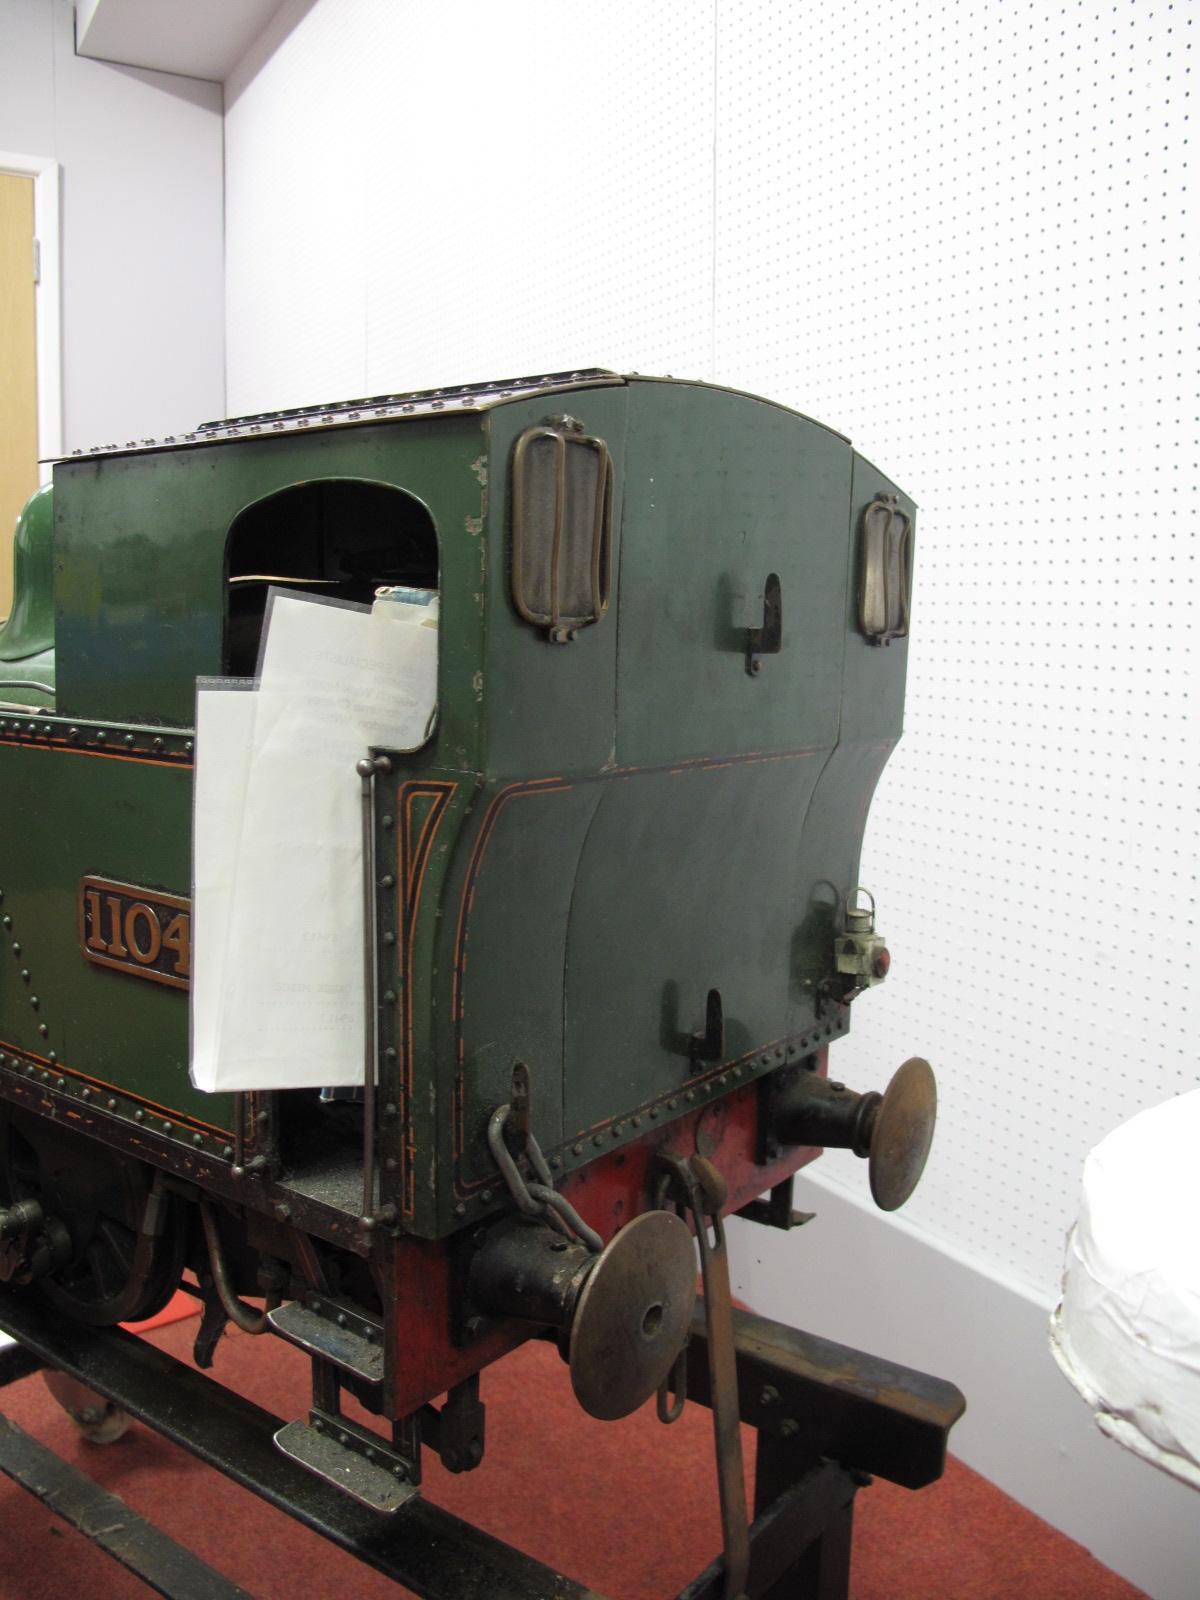 Lot 6 - A 7¼ Inch Gauge 0-4-0 Live Steam 'Midge' Design Locomotive, based on George Gentry design of Swansea